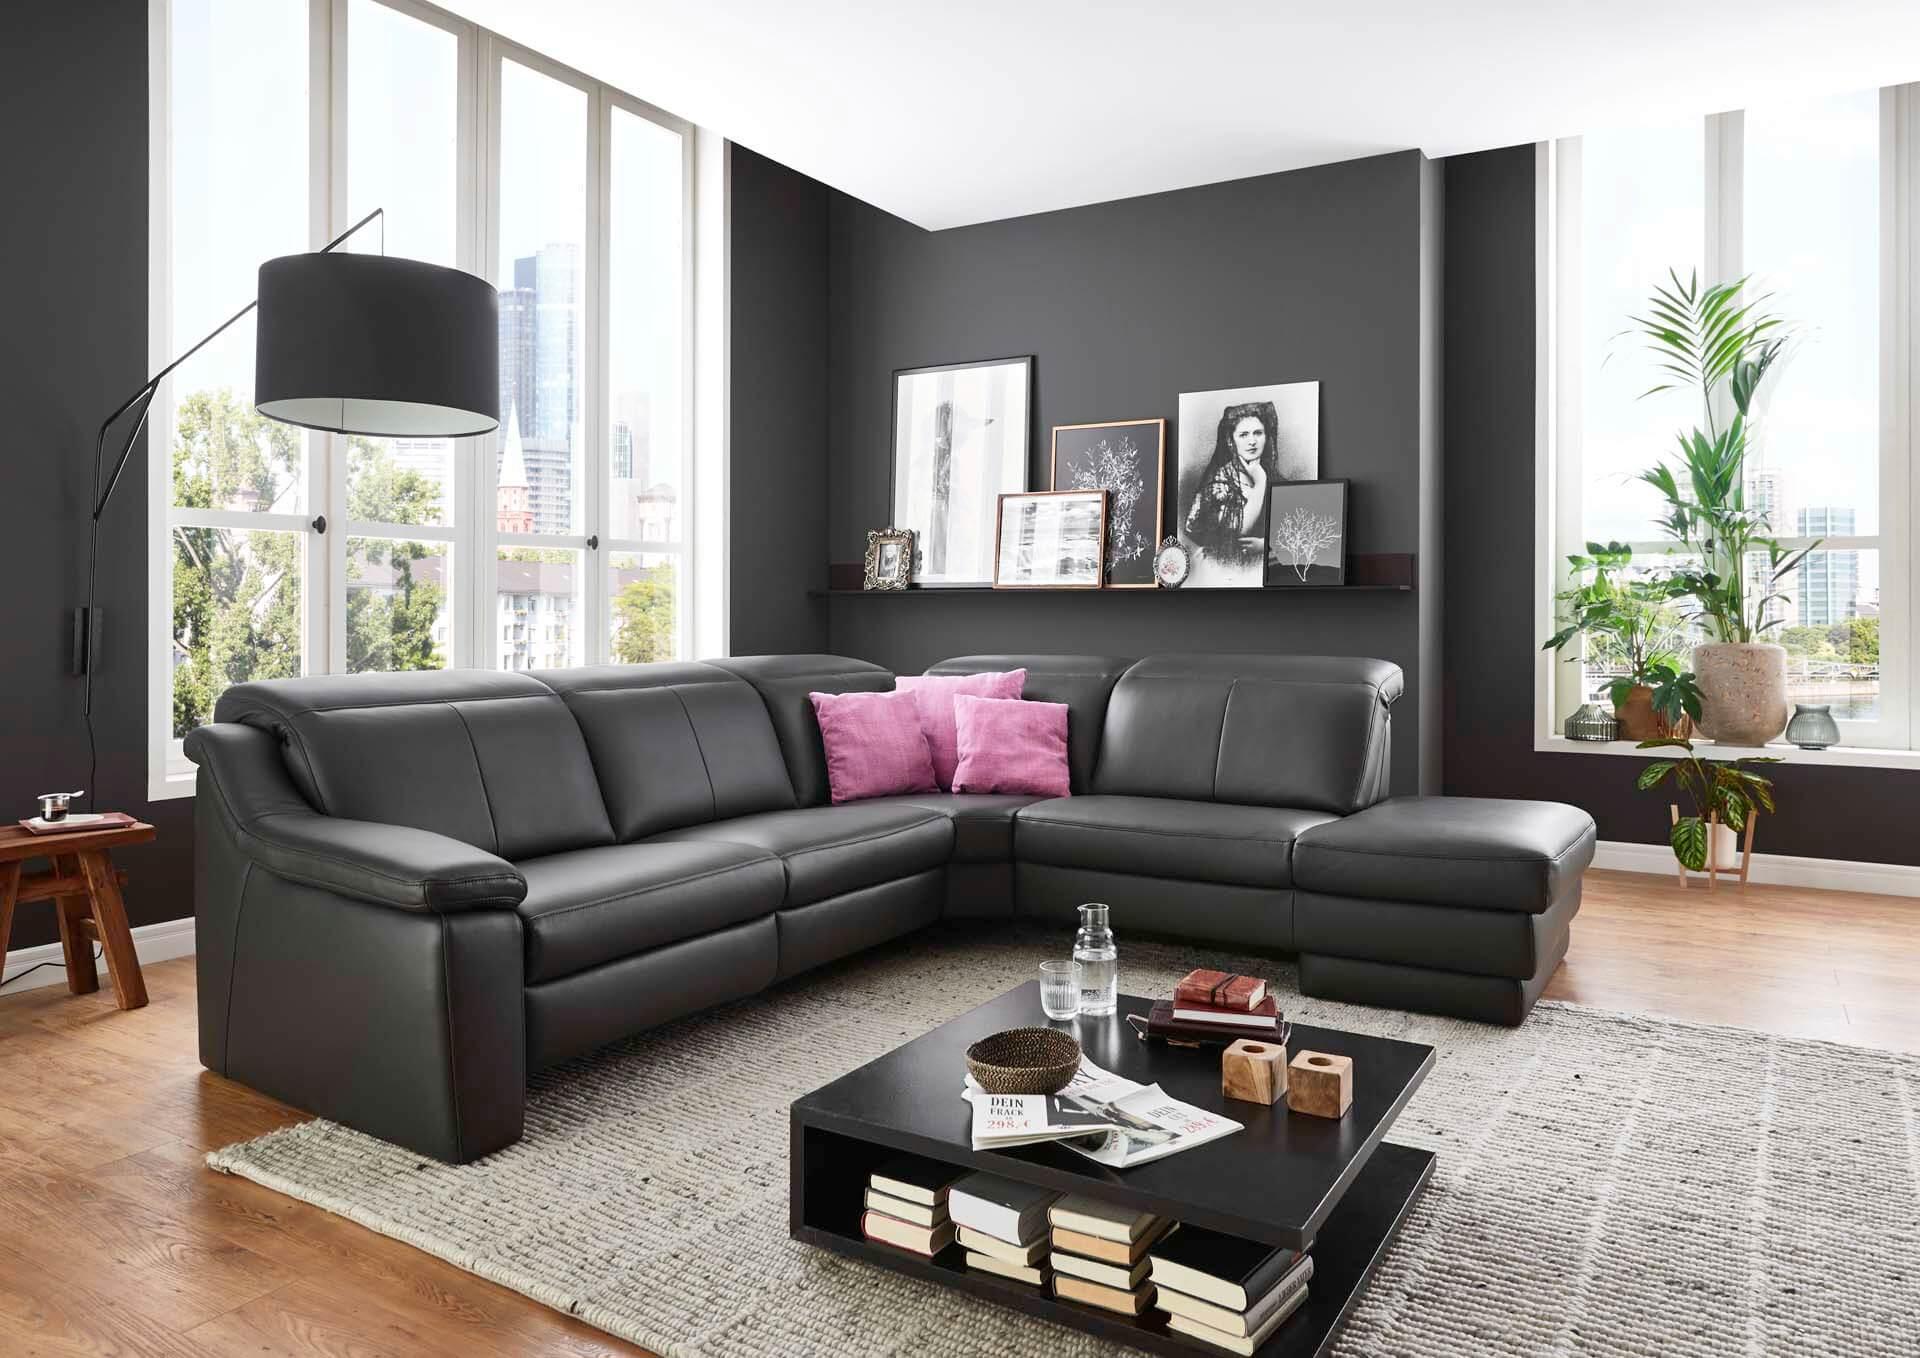 Sofa-Harlem-Com4Lux7